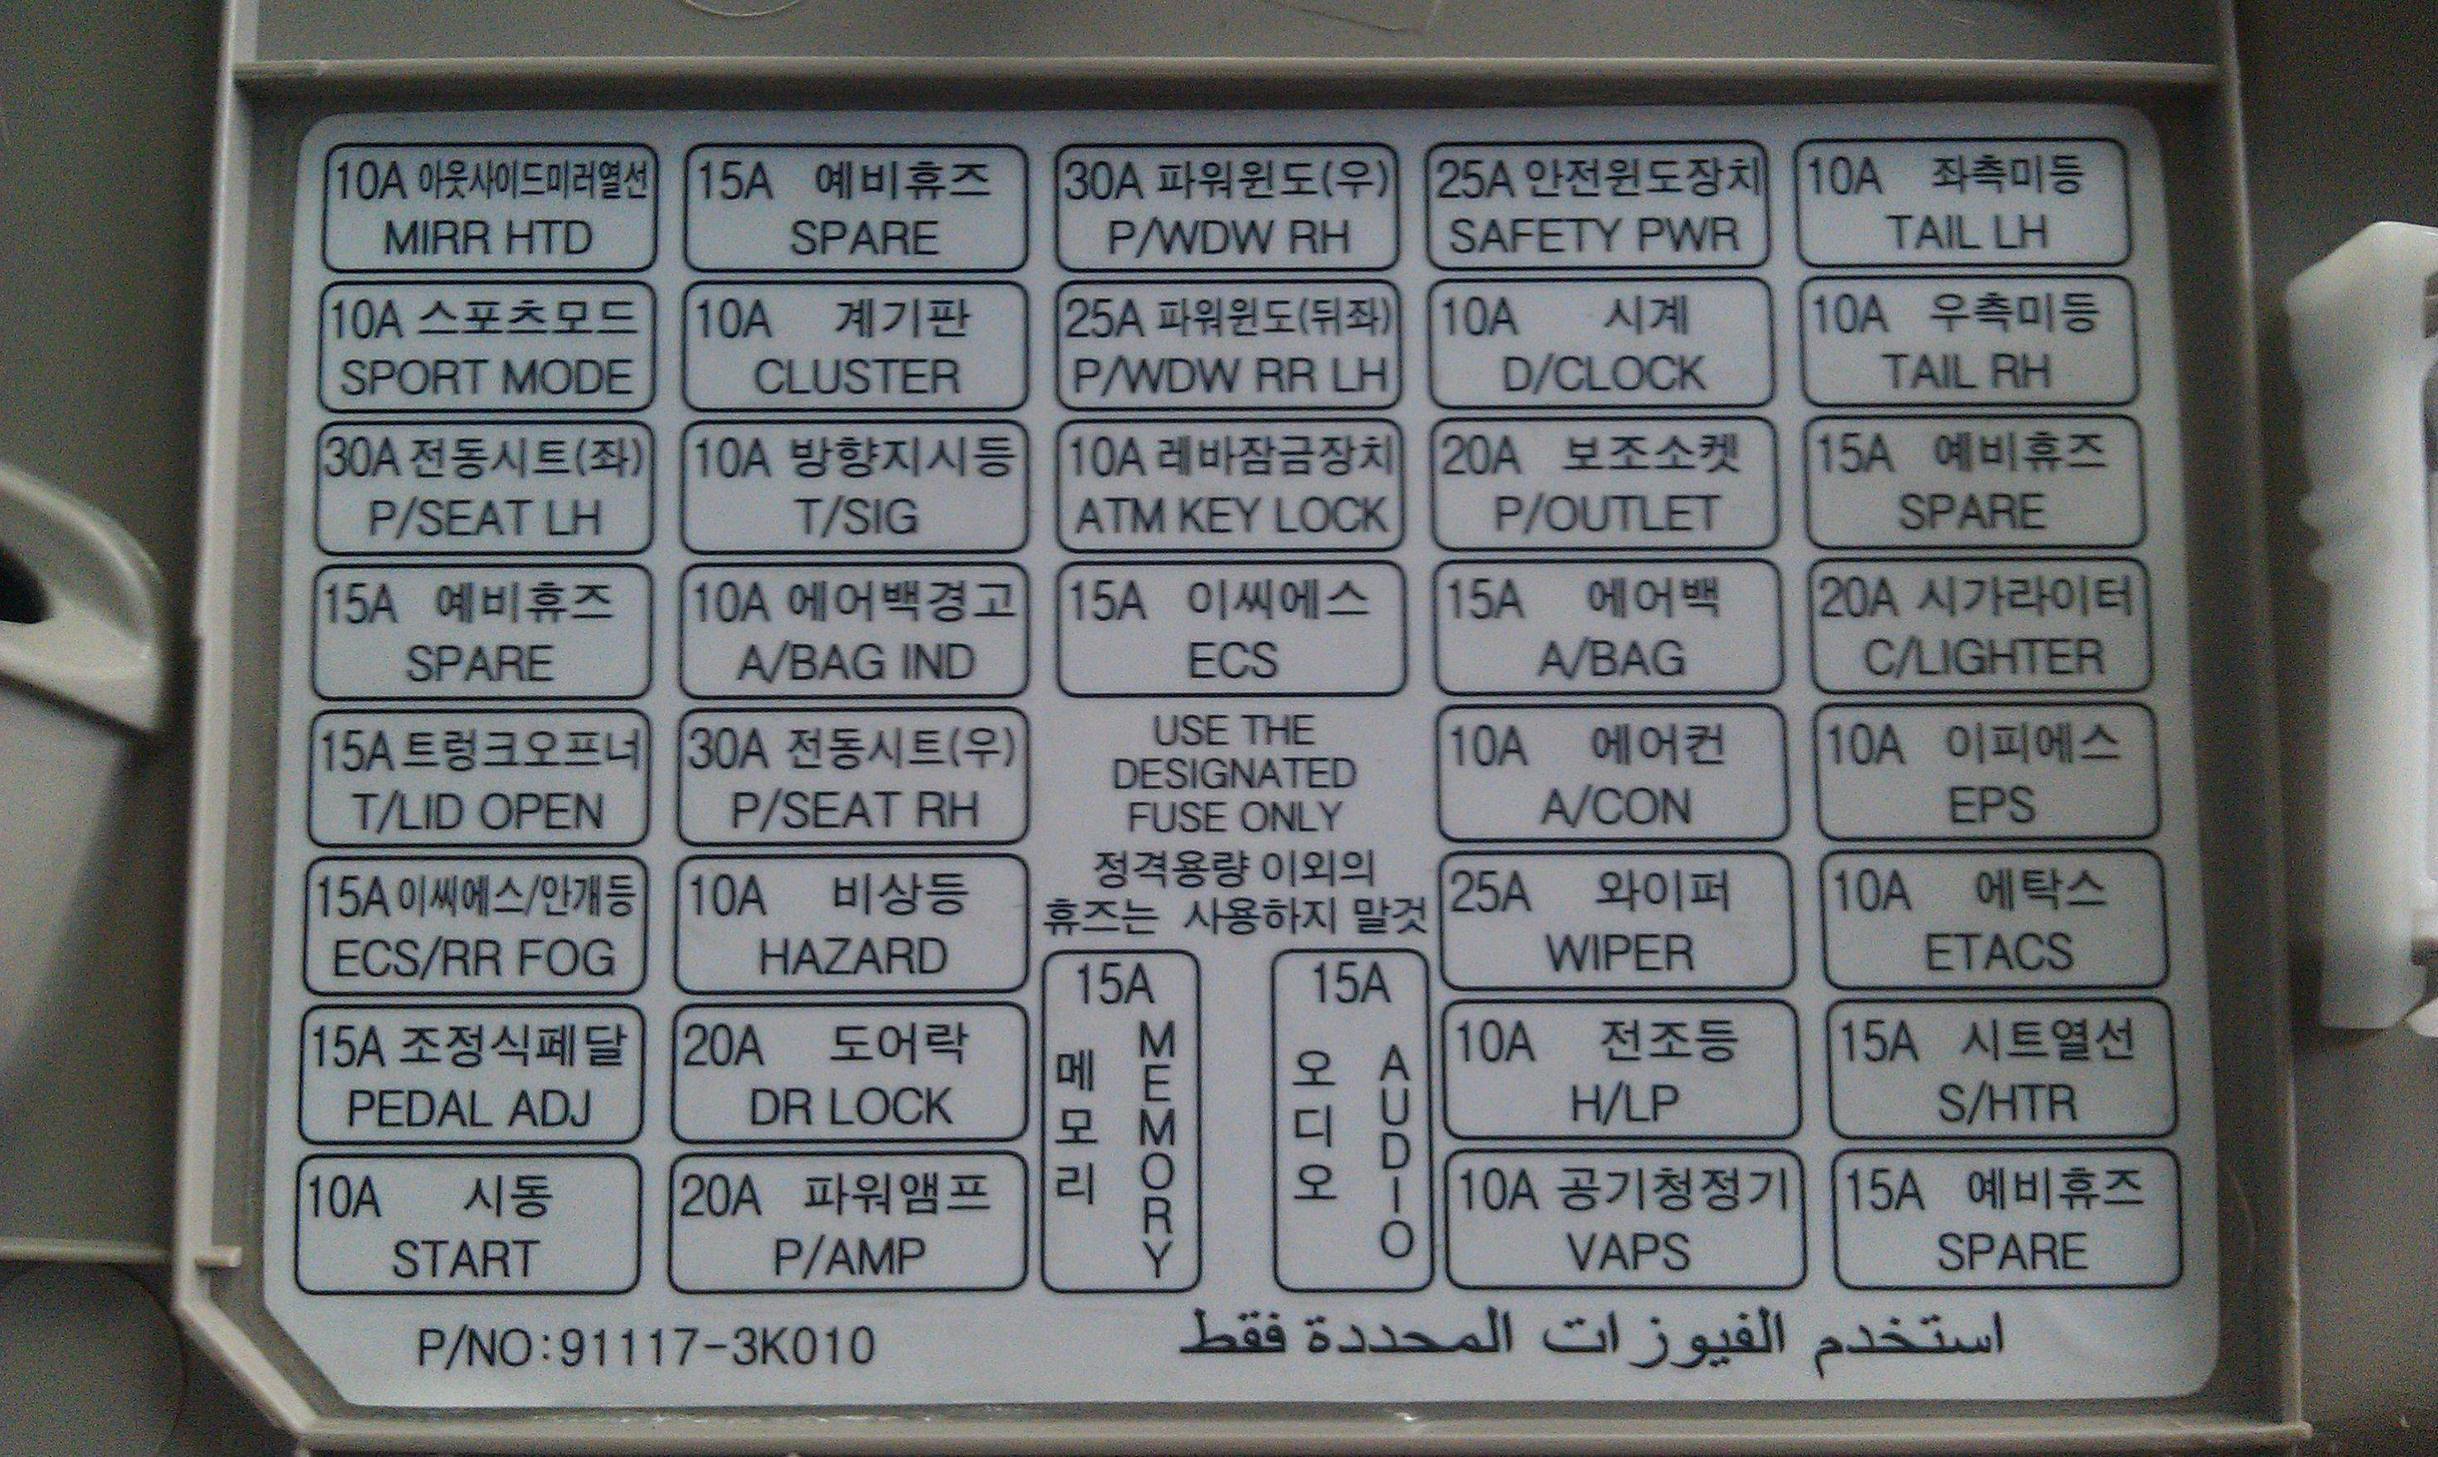 Kia Sorento Transfer Box Fuse Basic Guide Wiring Diagram \u2022 2005 Kia  Sedona Fuse Panel Diagram 2004 Kia Sorento Fuse Box Diagram